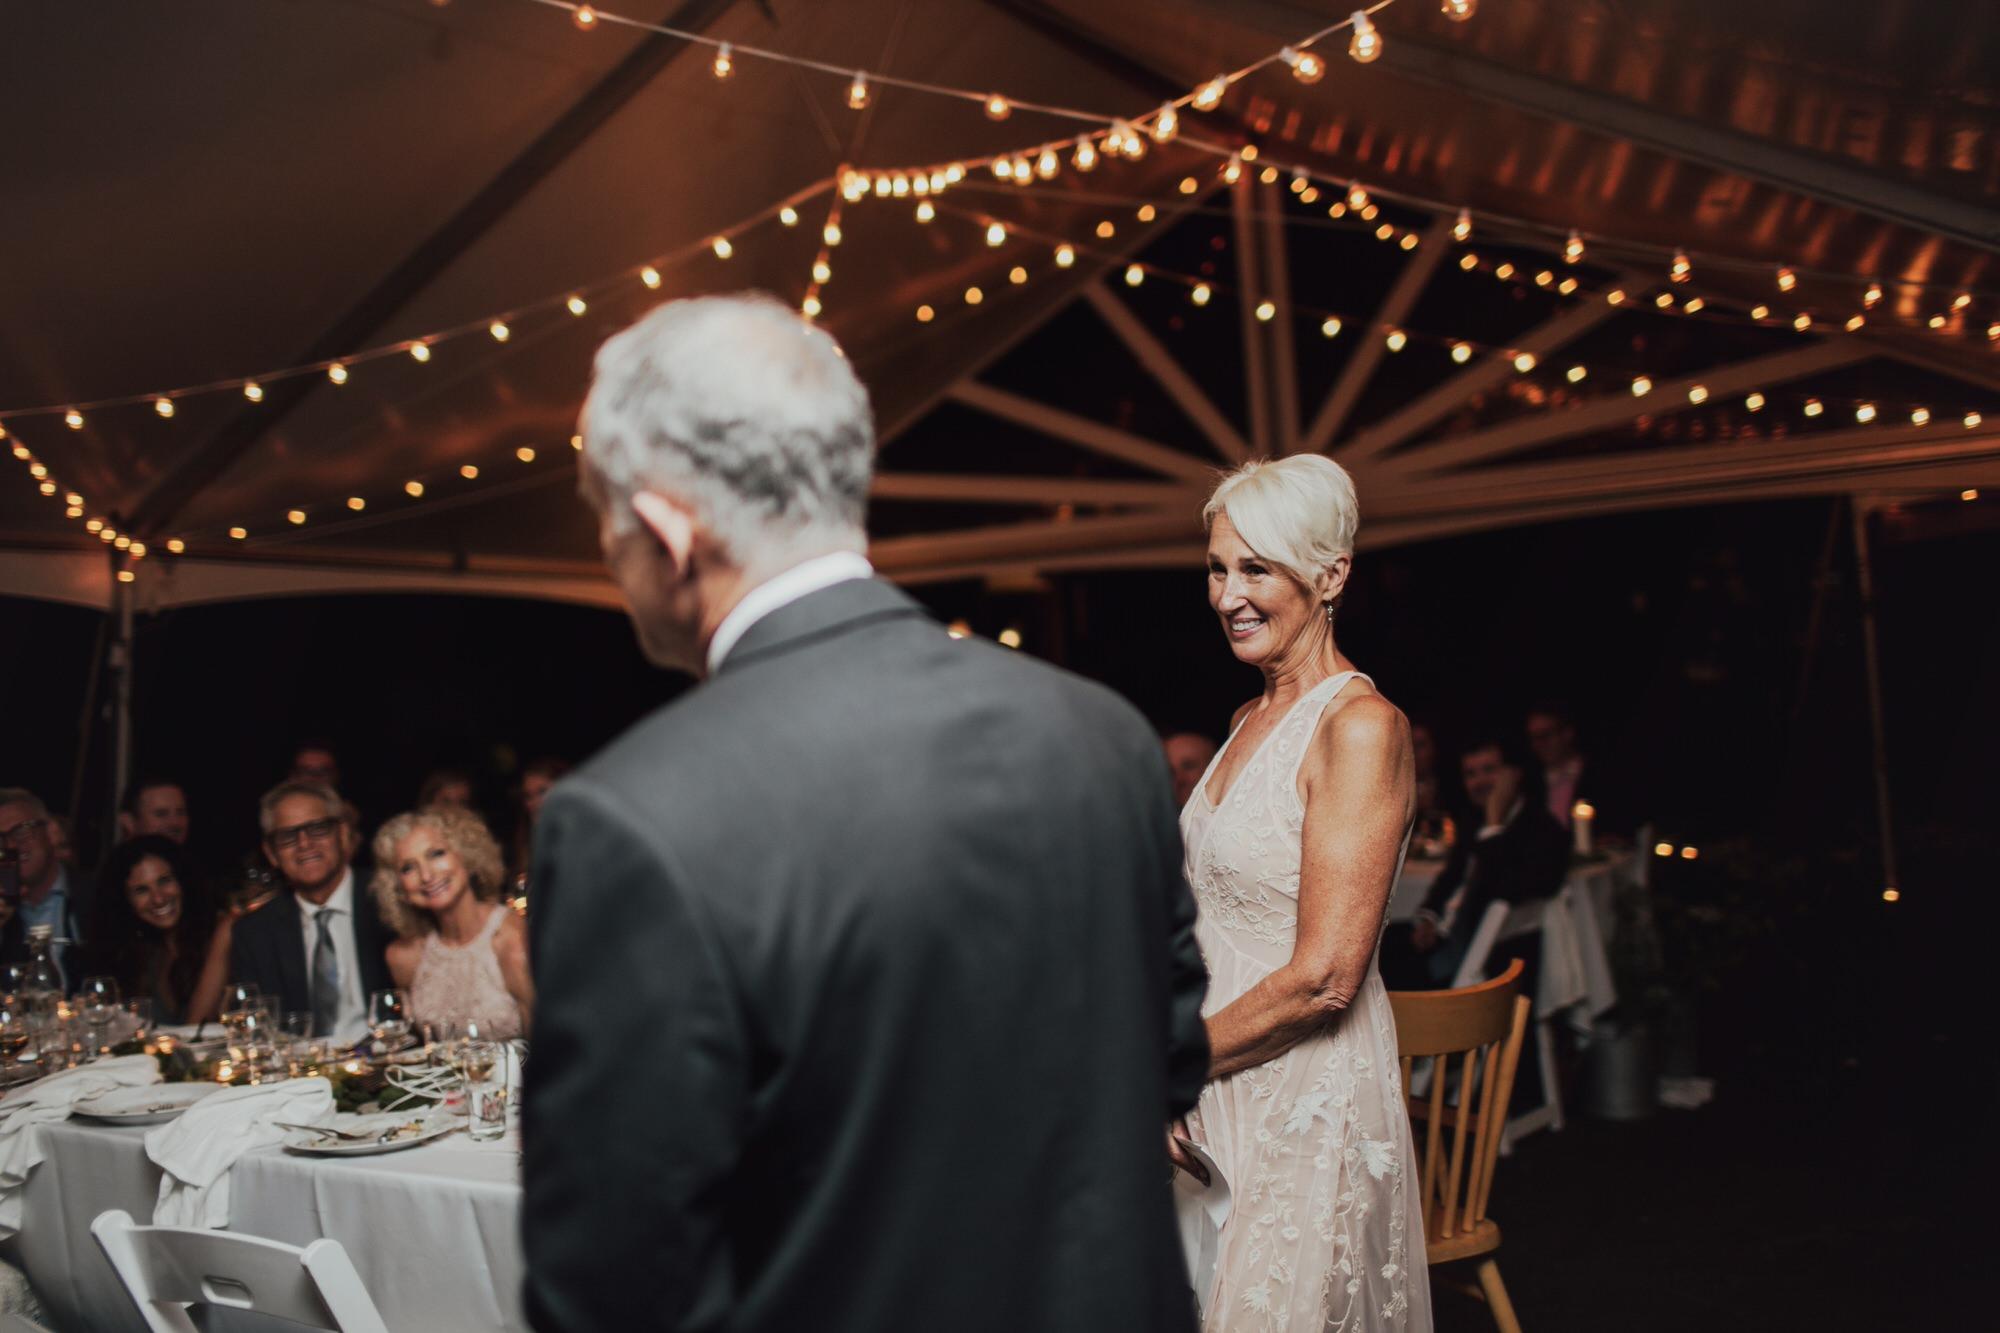 emily-aaron-rochester-new-york-wedding-photographer-119.JPG